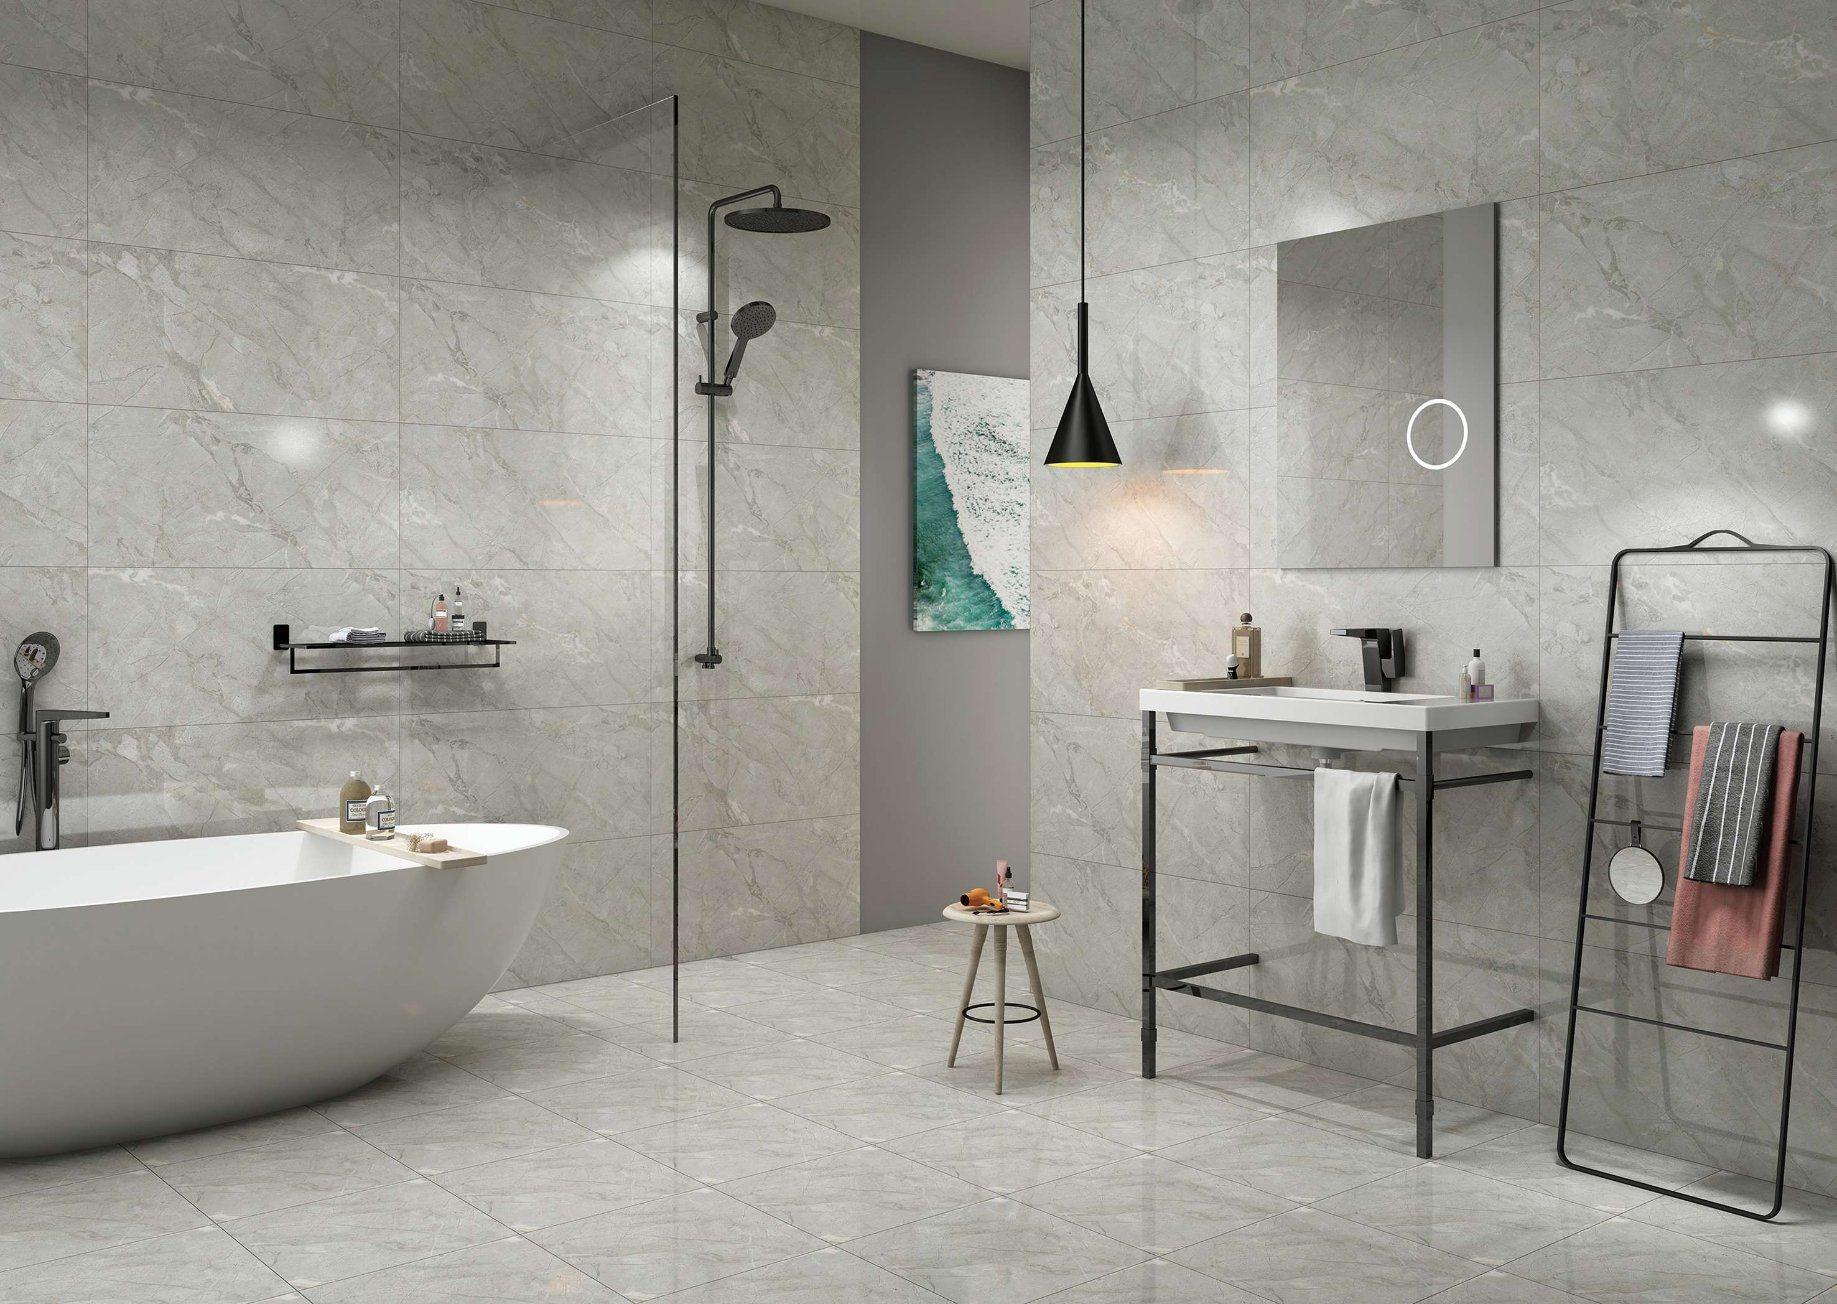 Ceramic Wall Tiles Bathroom Kitchen, Porcelain Tiles For Bathroom